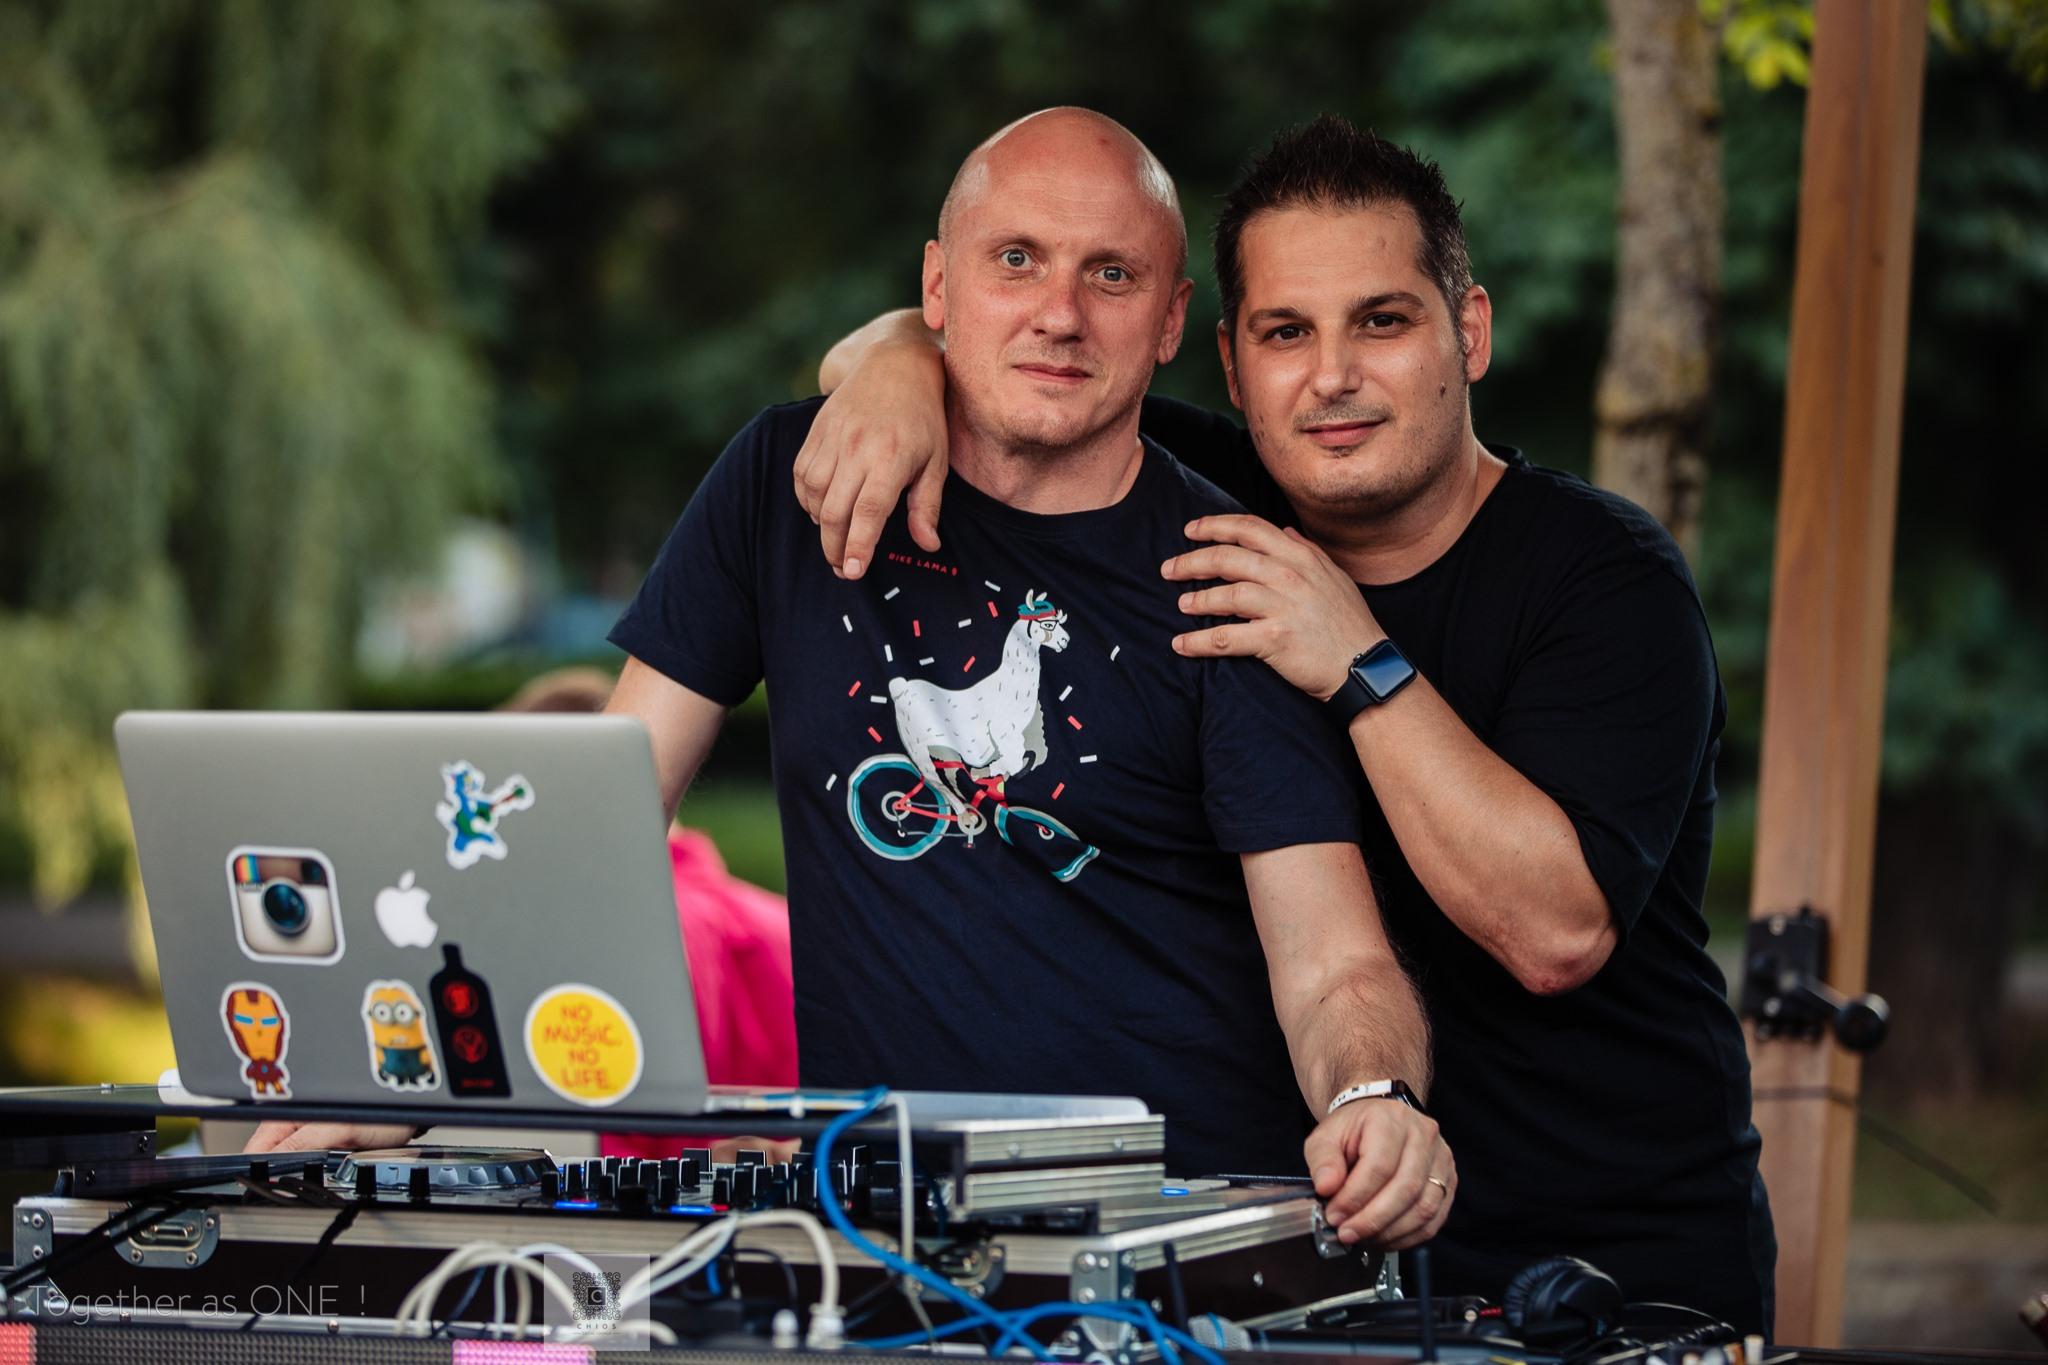 4 ani! CHIOS Social Lounge - DAY 2 - Pappa M & Mc Dylma